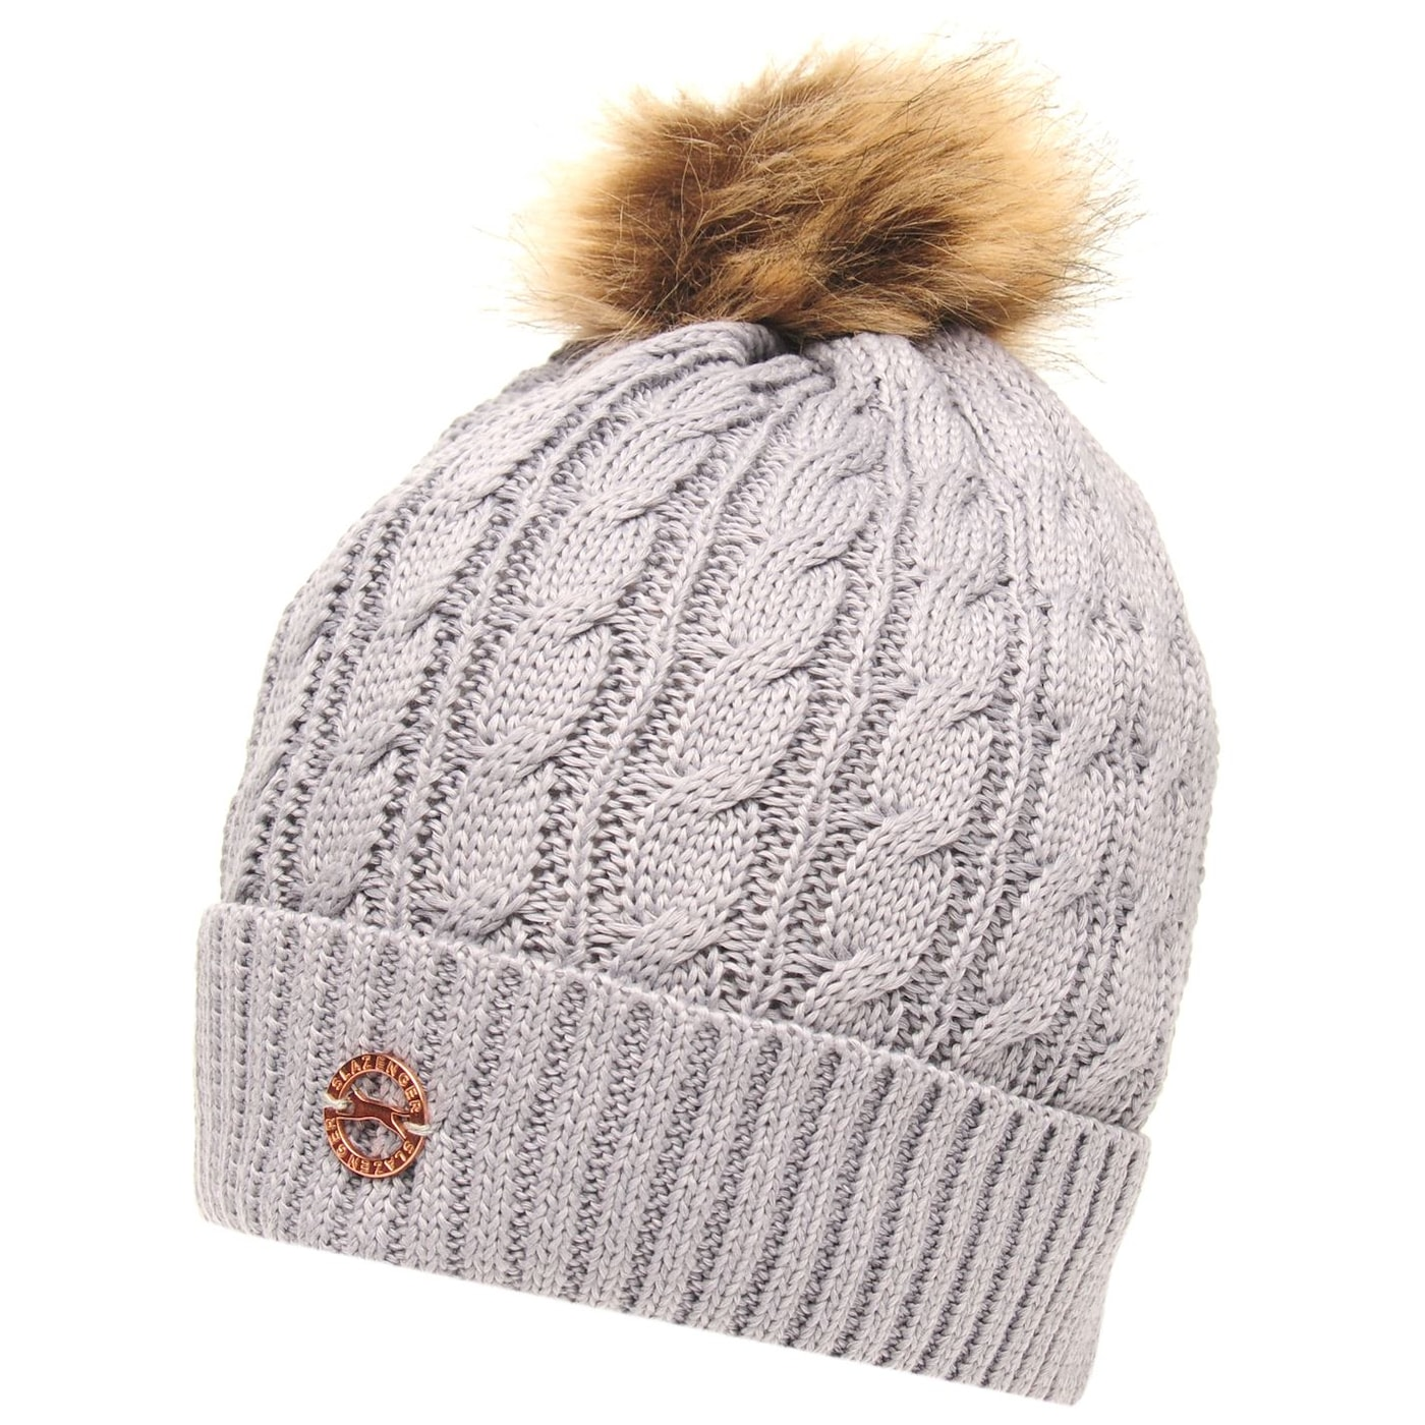 Slazenger Golf Knit Hat Ladies